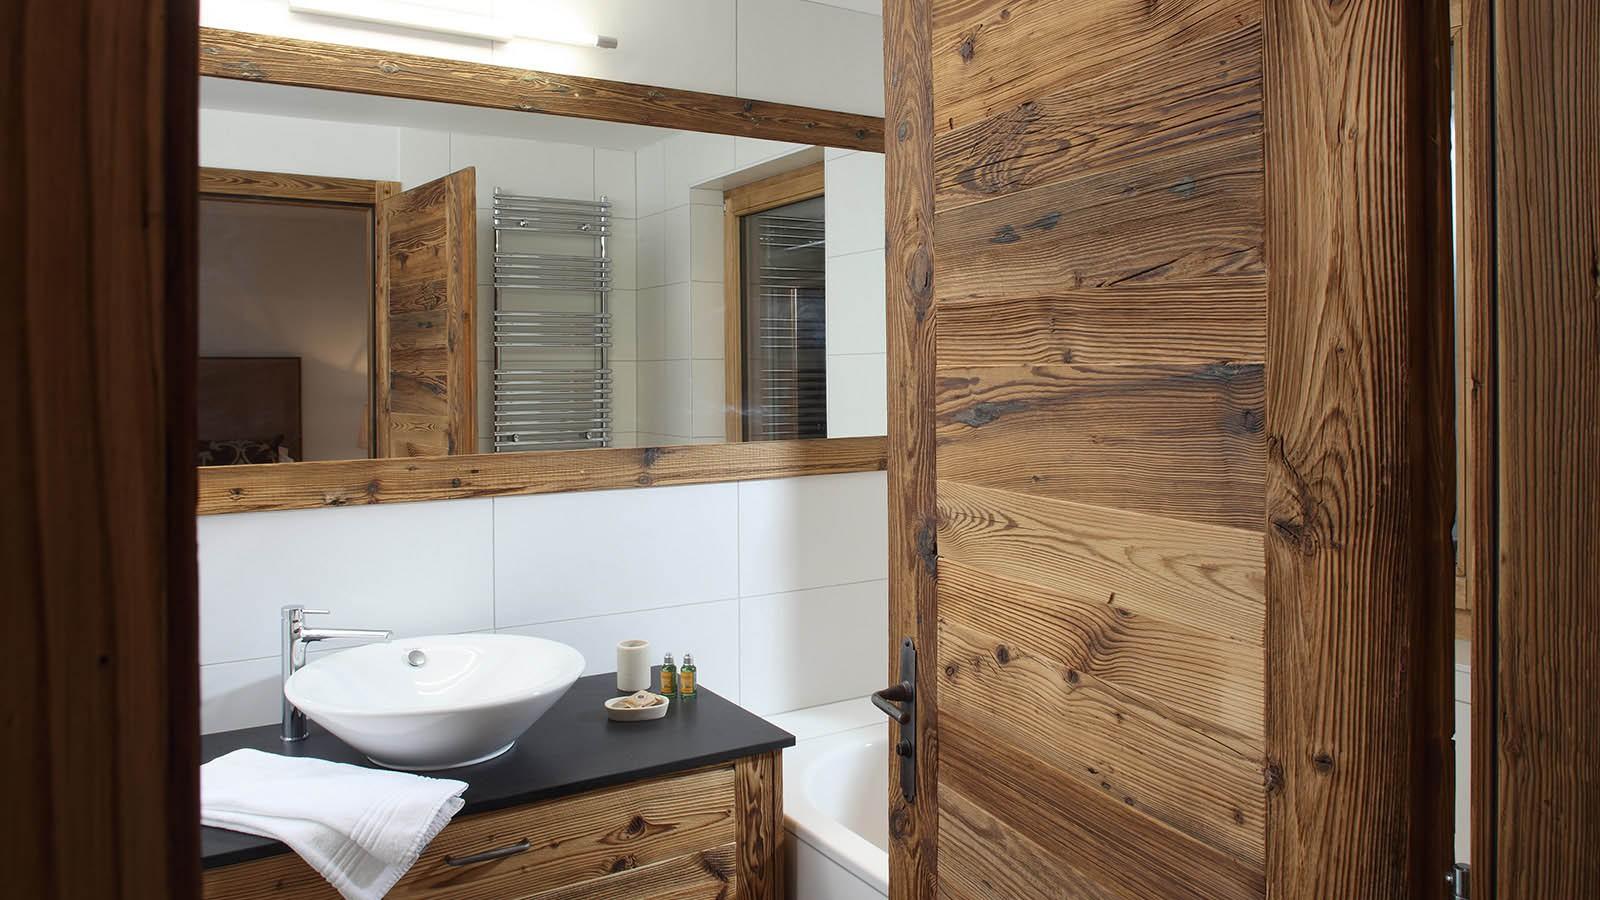 Bathroom in chalet Rosablanche, Nendaz